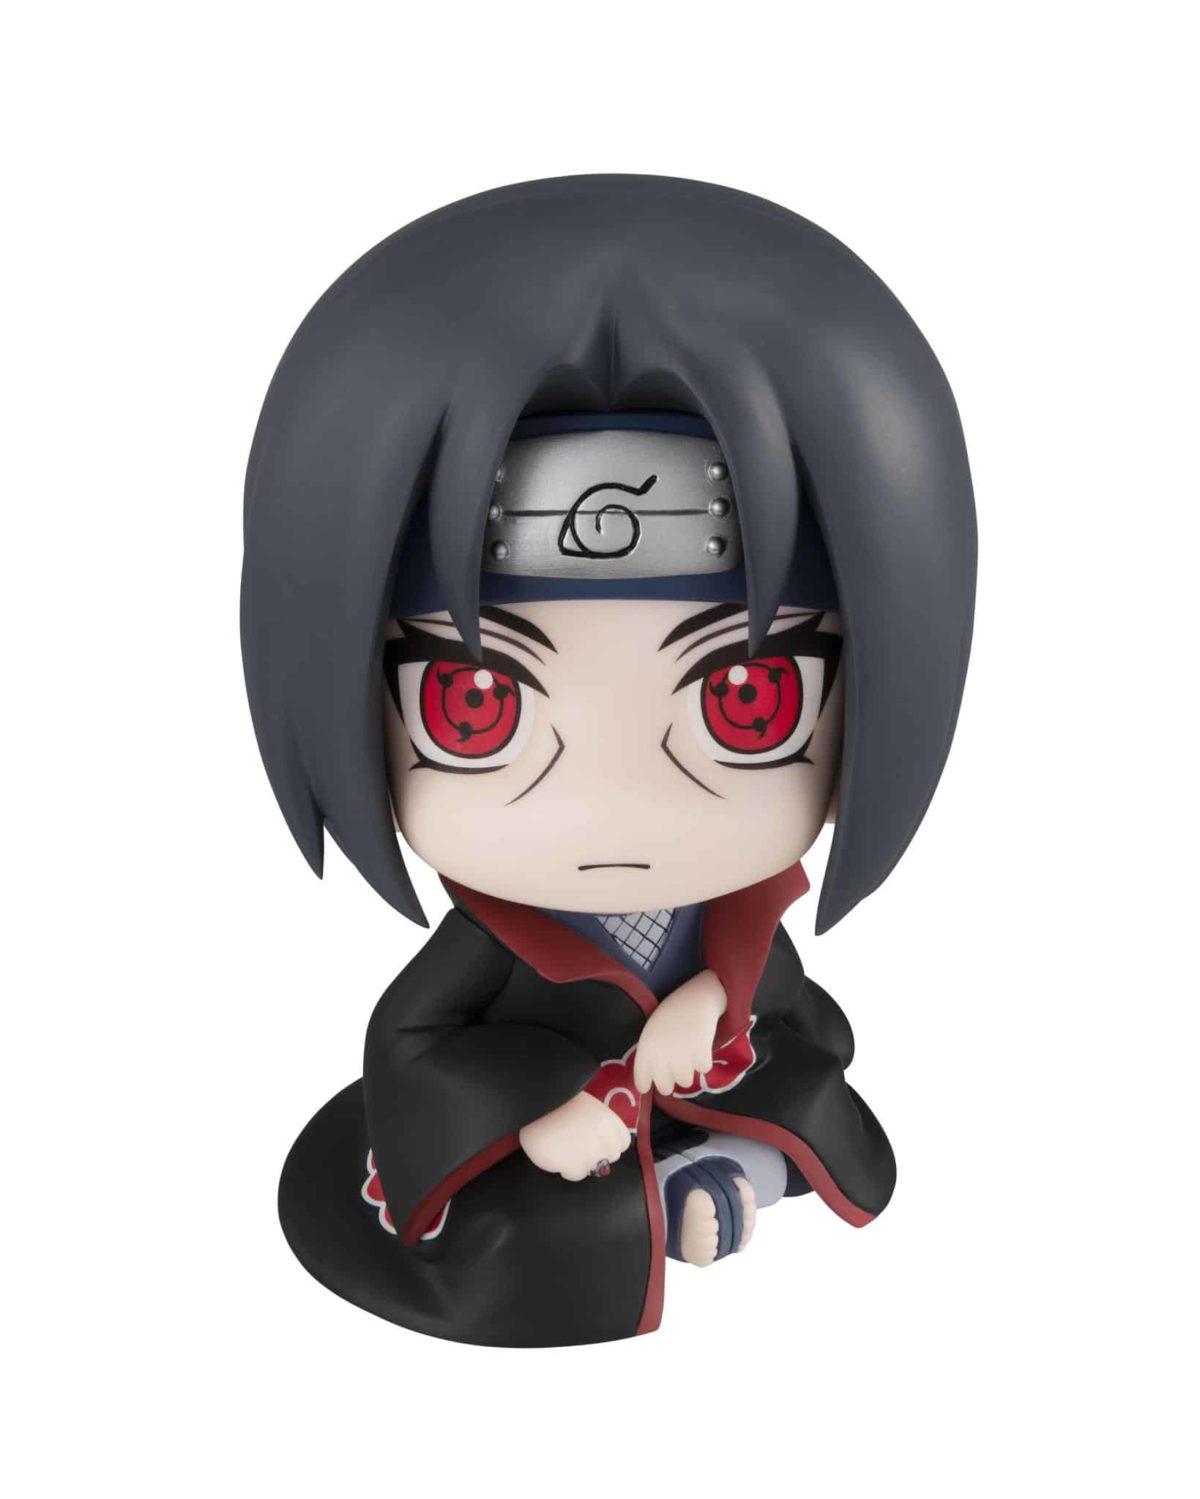 Naruto Shippuden Uchiha Itachi Lookup Series Figures 2